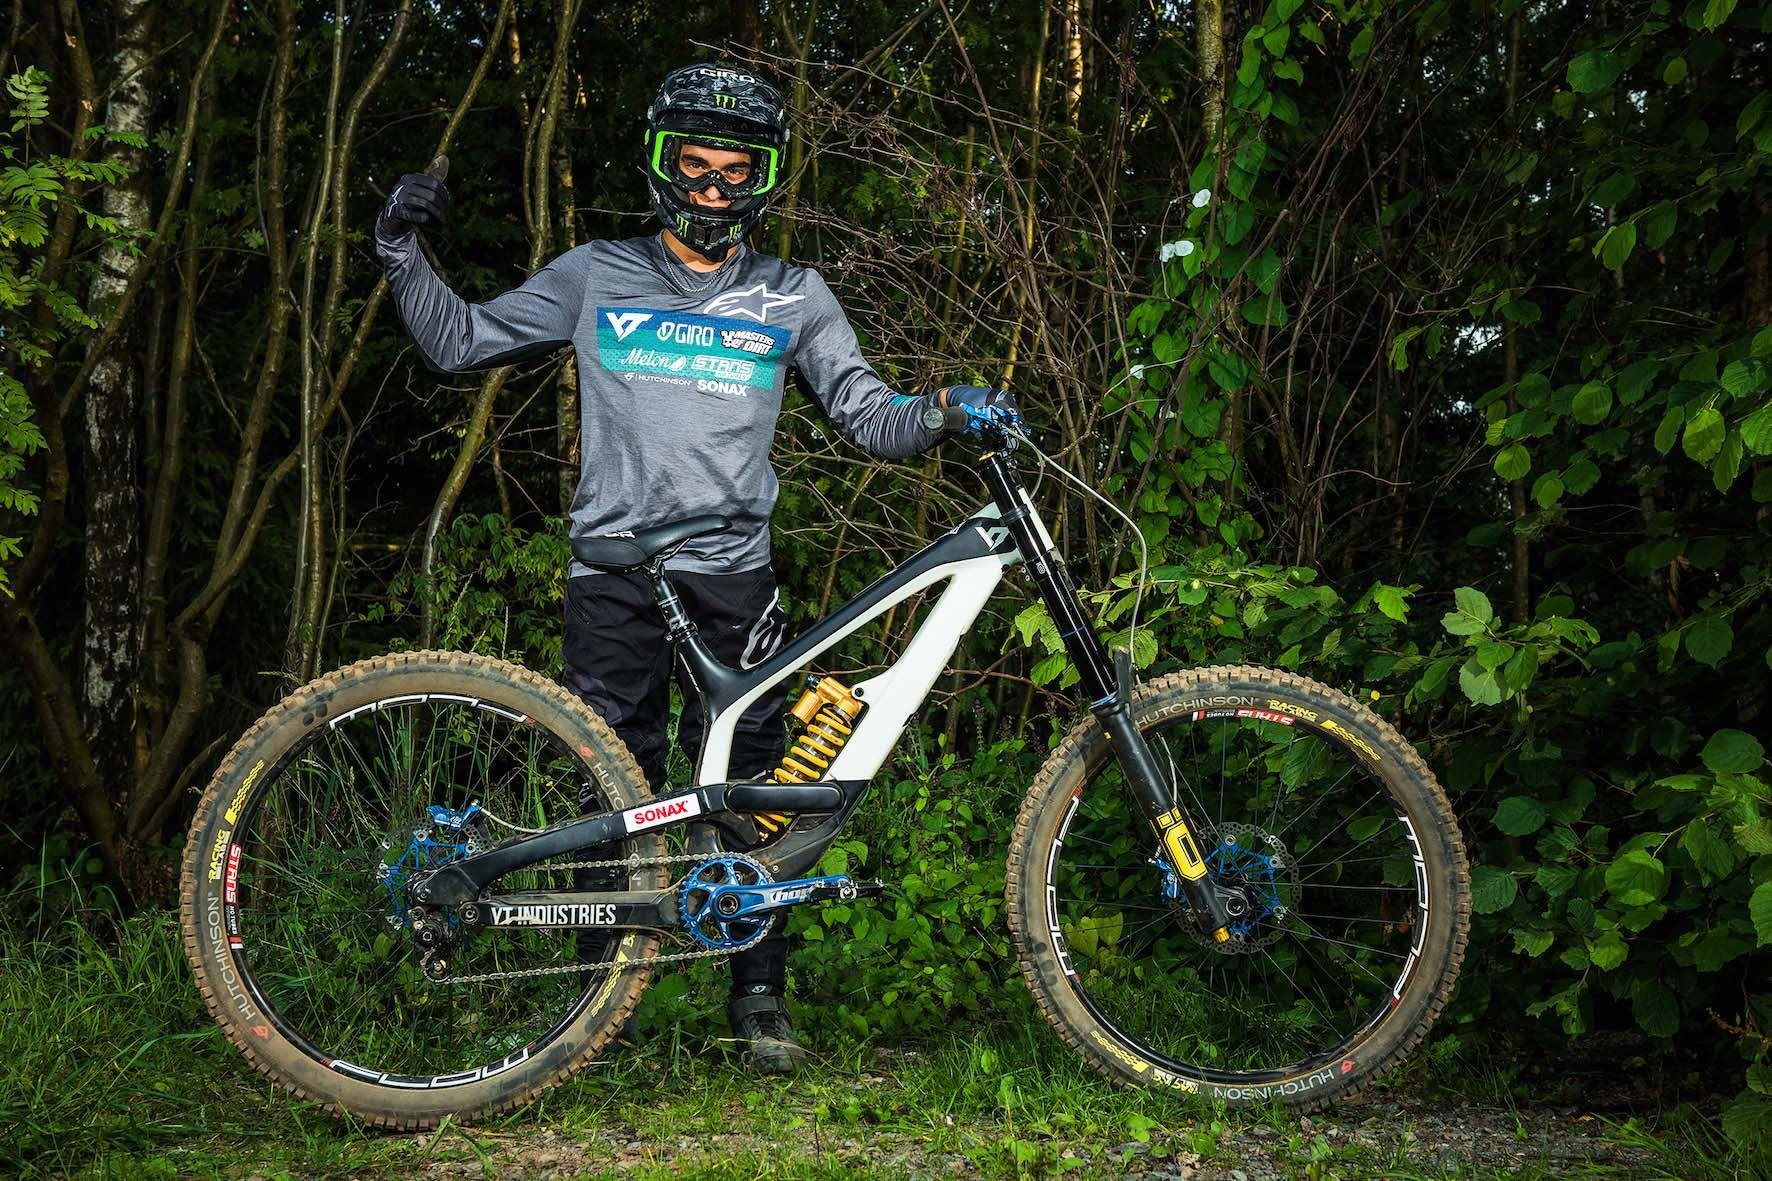 Bikes of Loosefest XL 2019 - Adolf Silva on YT